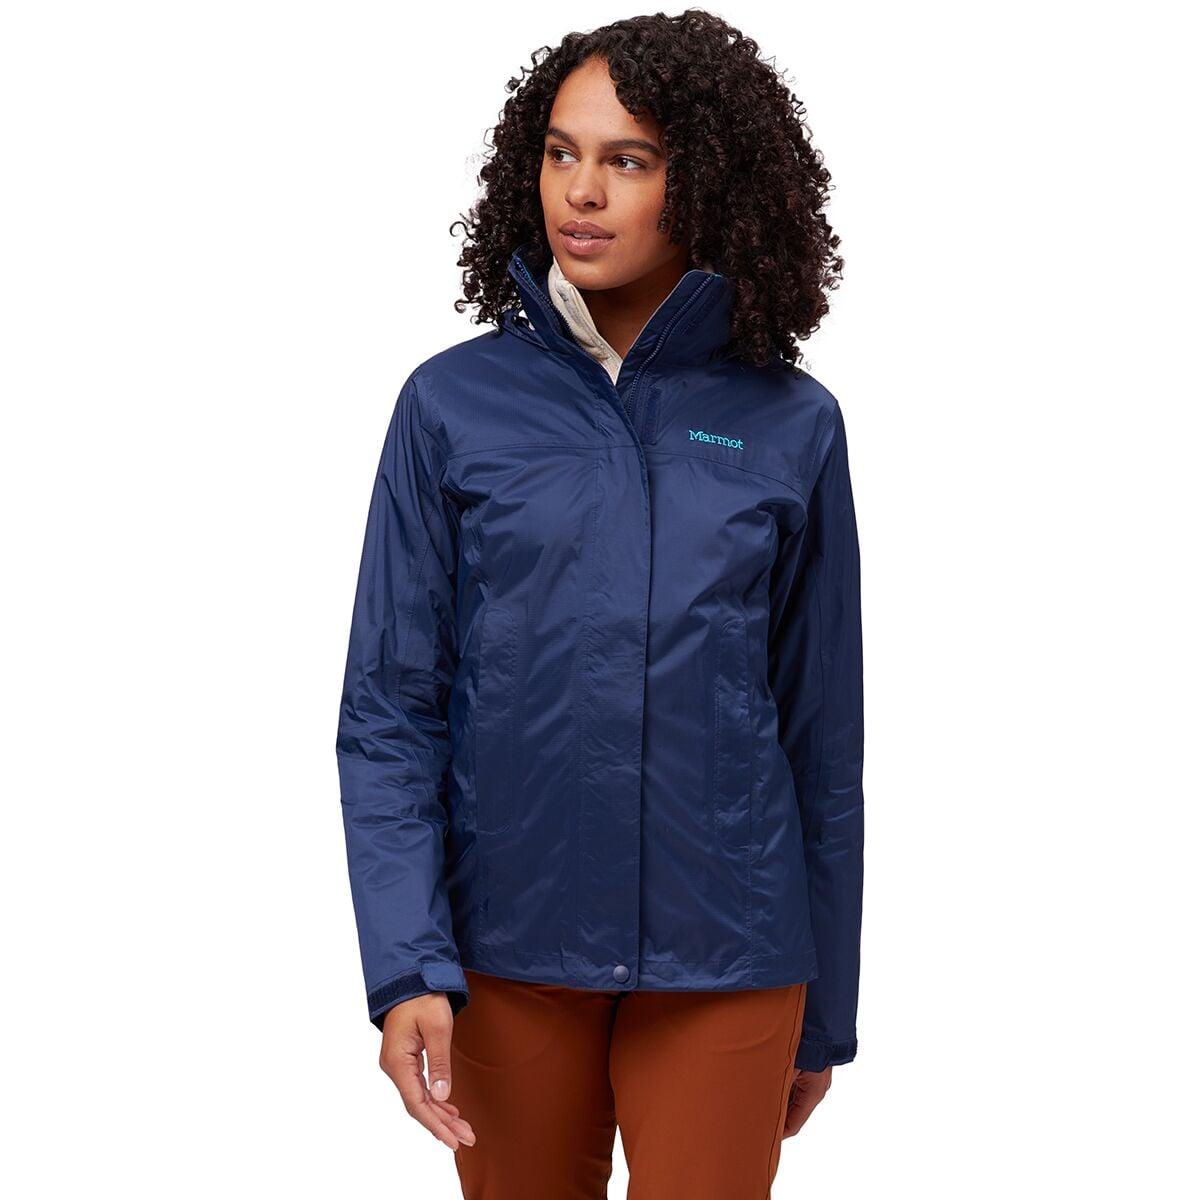 special discount best online elegant shape Marmot PreCip Eco Jacket - Women's   Backcountry.com